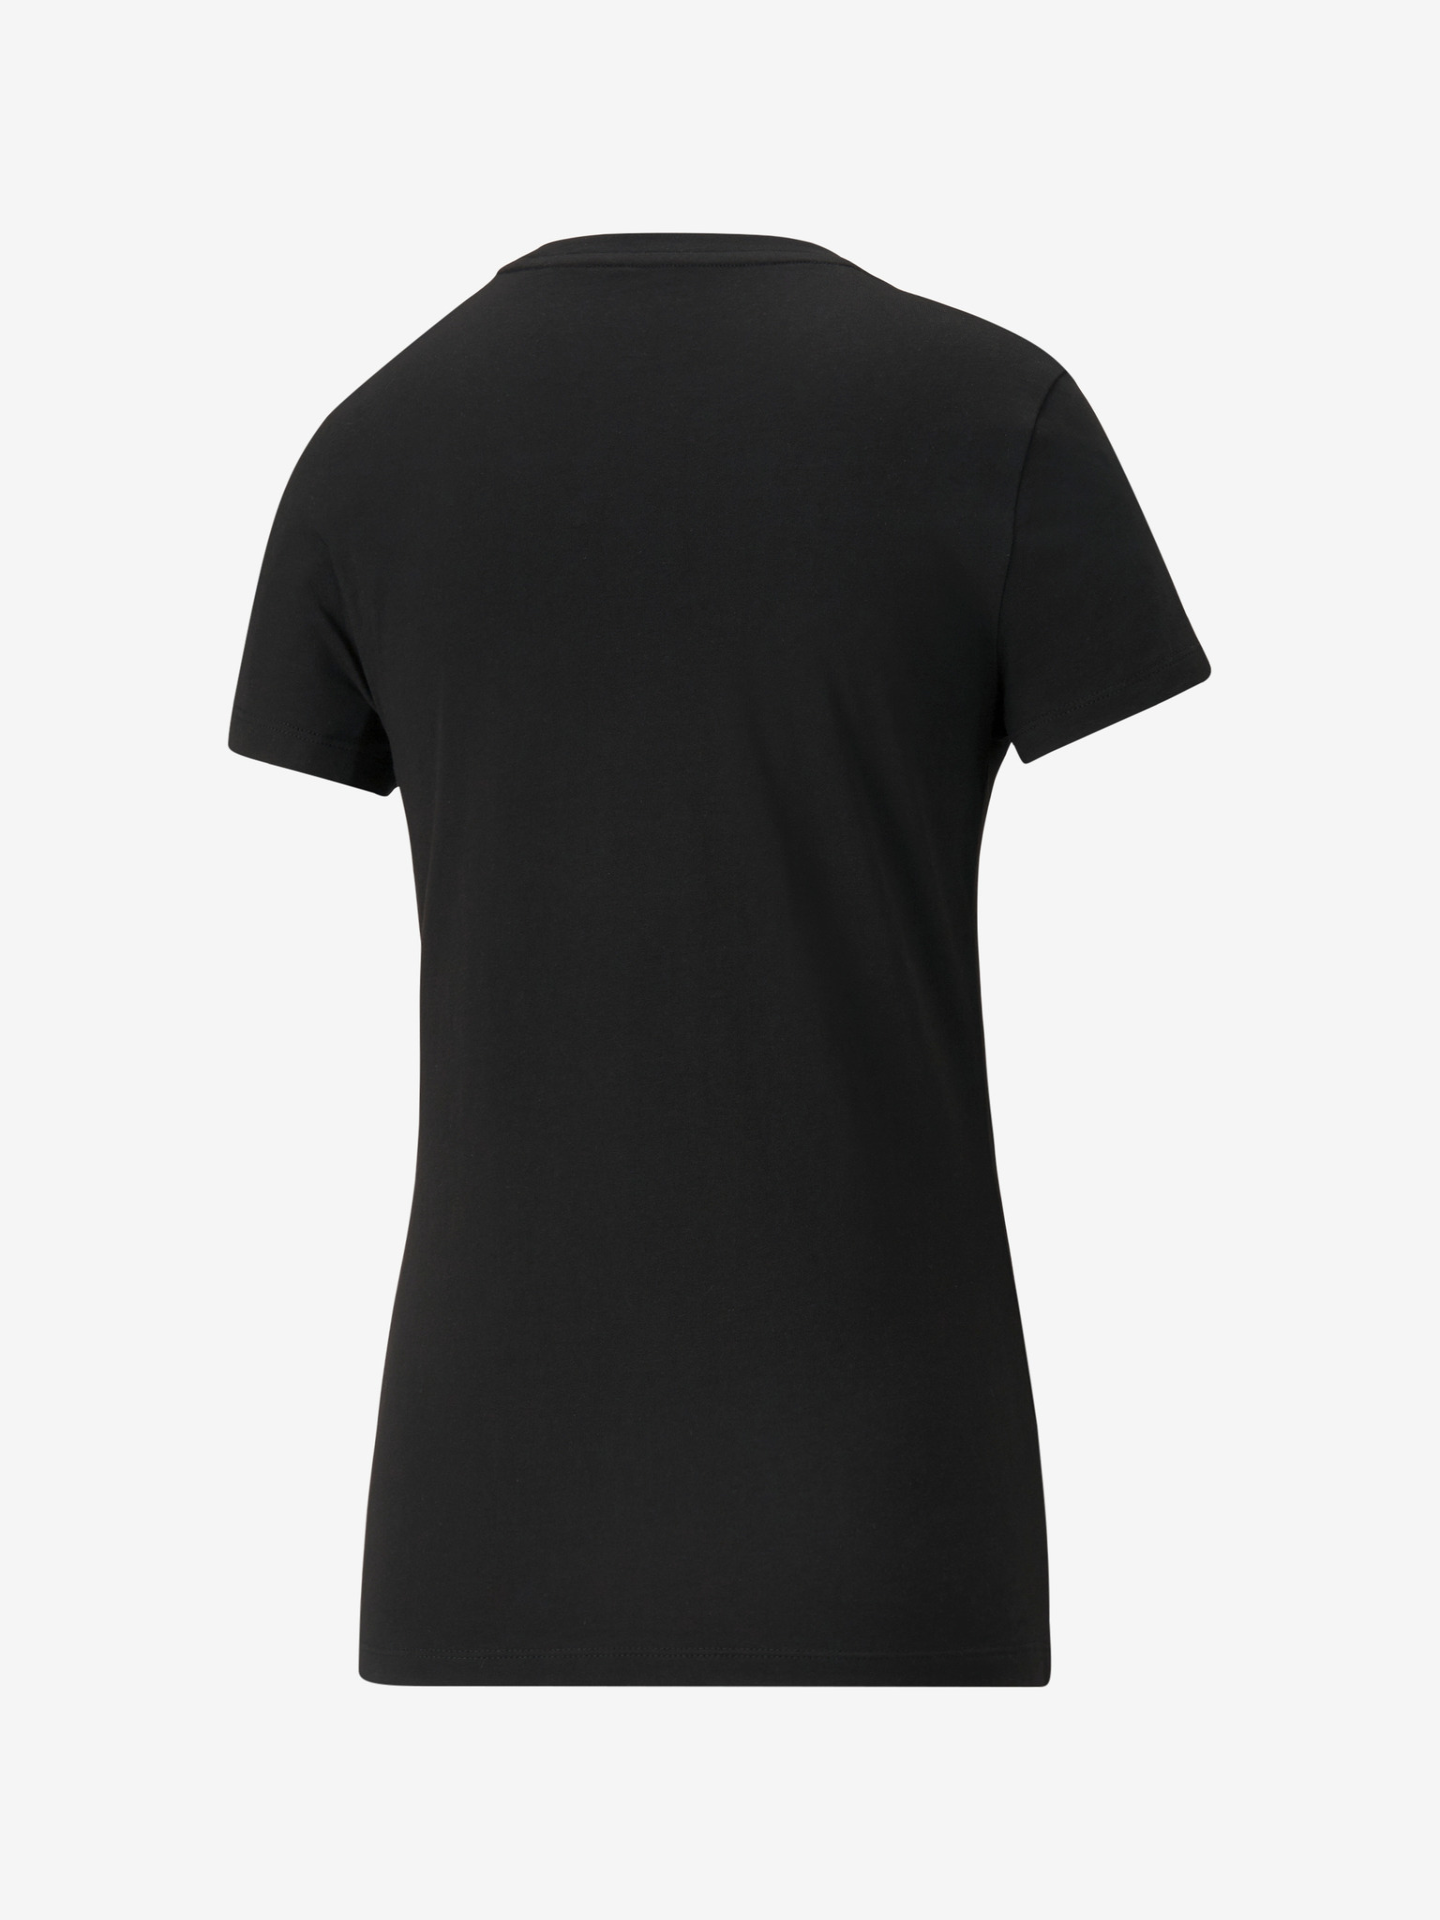 Puma Graphic Streetwear T-shirt Black